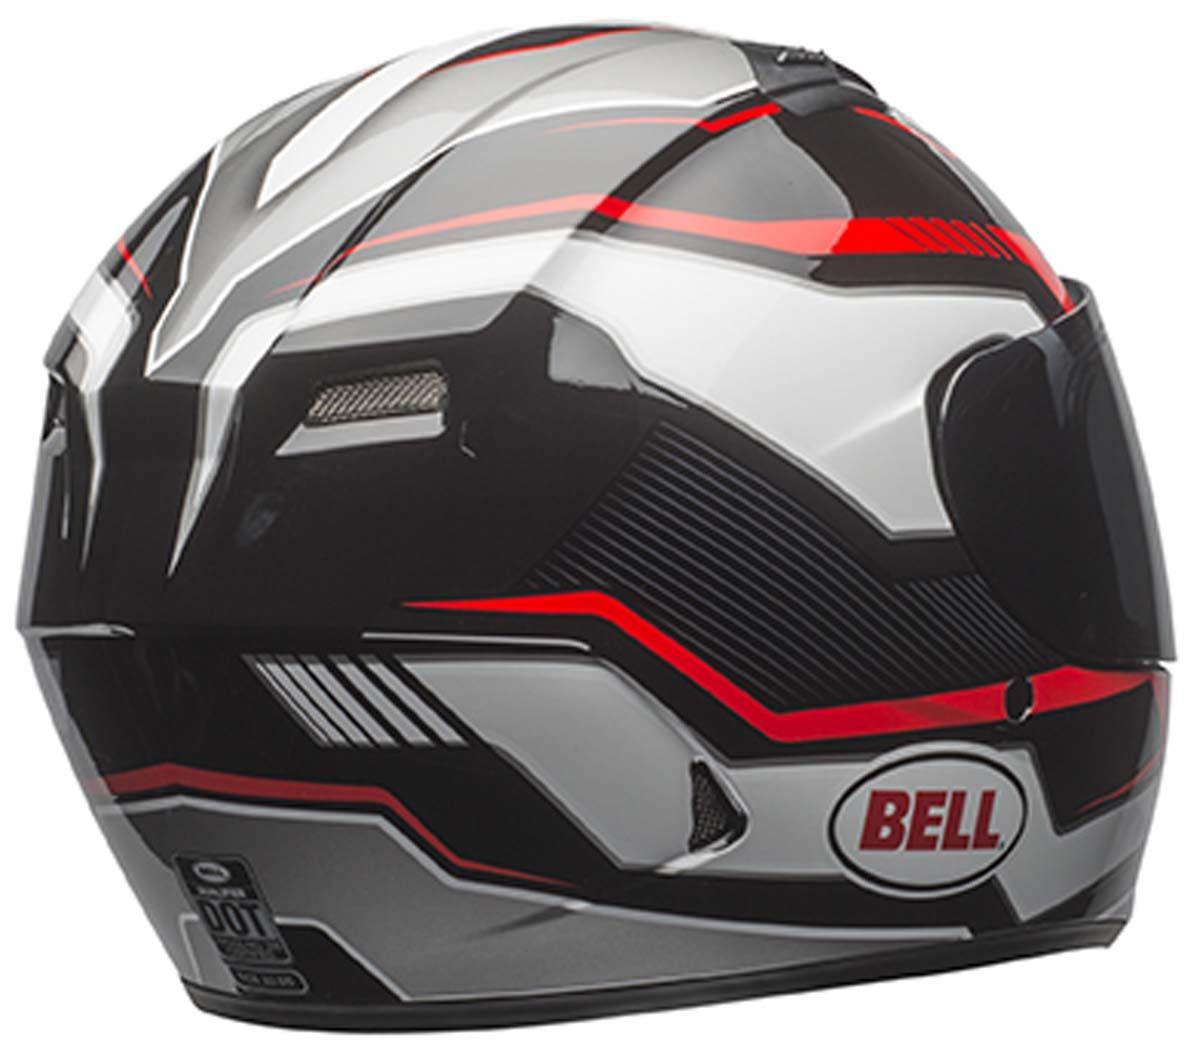 Bell-Qualifier-Helmet-Full-Face-Motorcycle-Clear-Shield-DOT-XS-3XL miniature 18